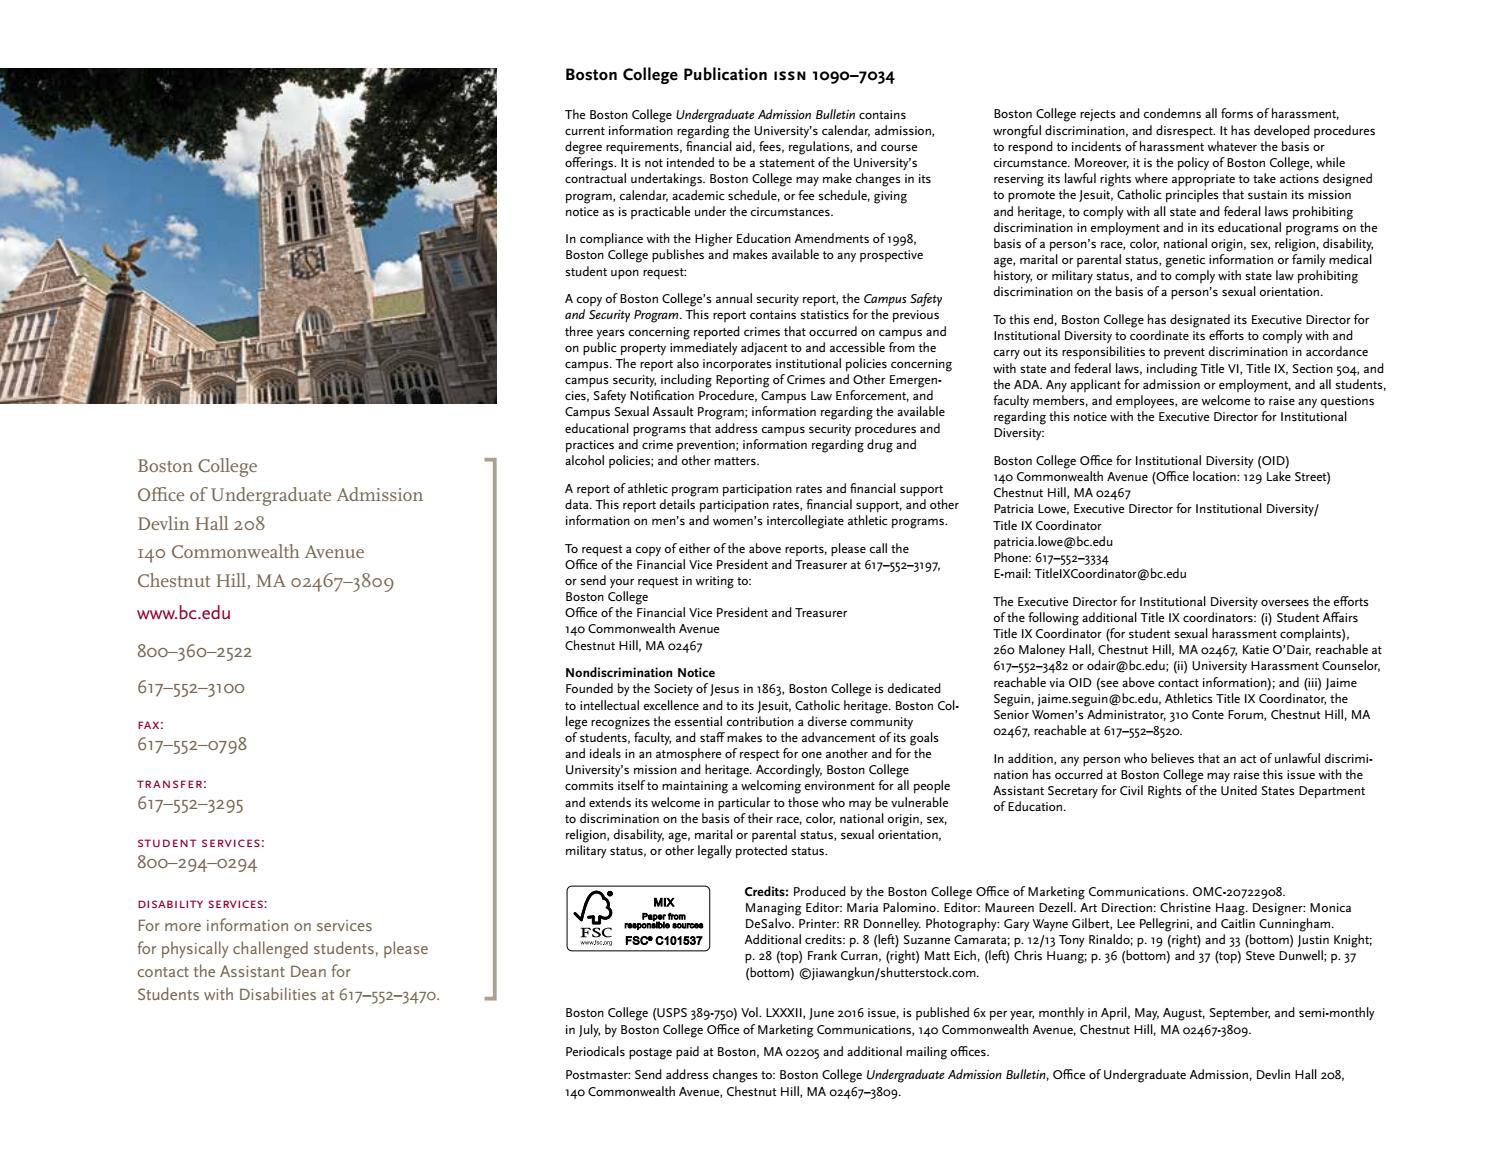 Boston College Undergraduate Admission Bulletin by Boston College - issuu